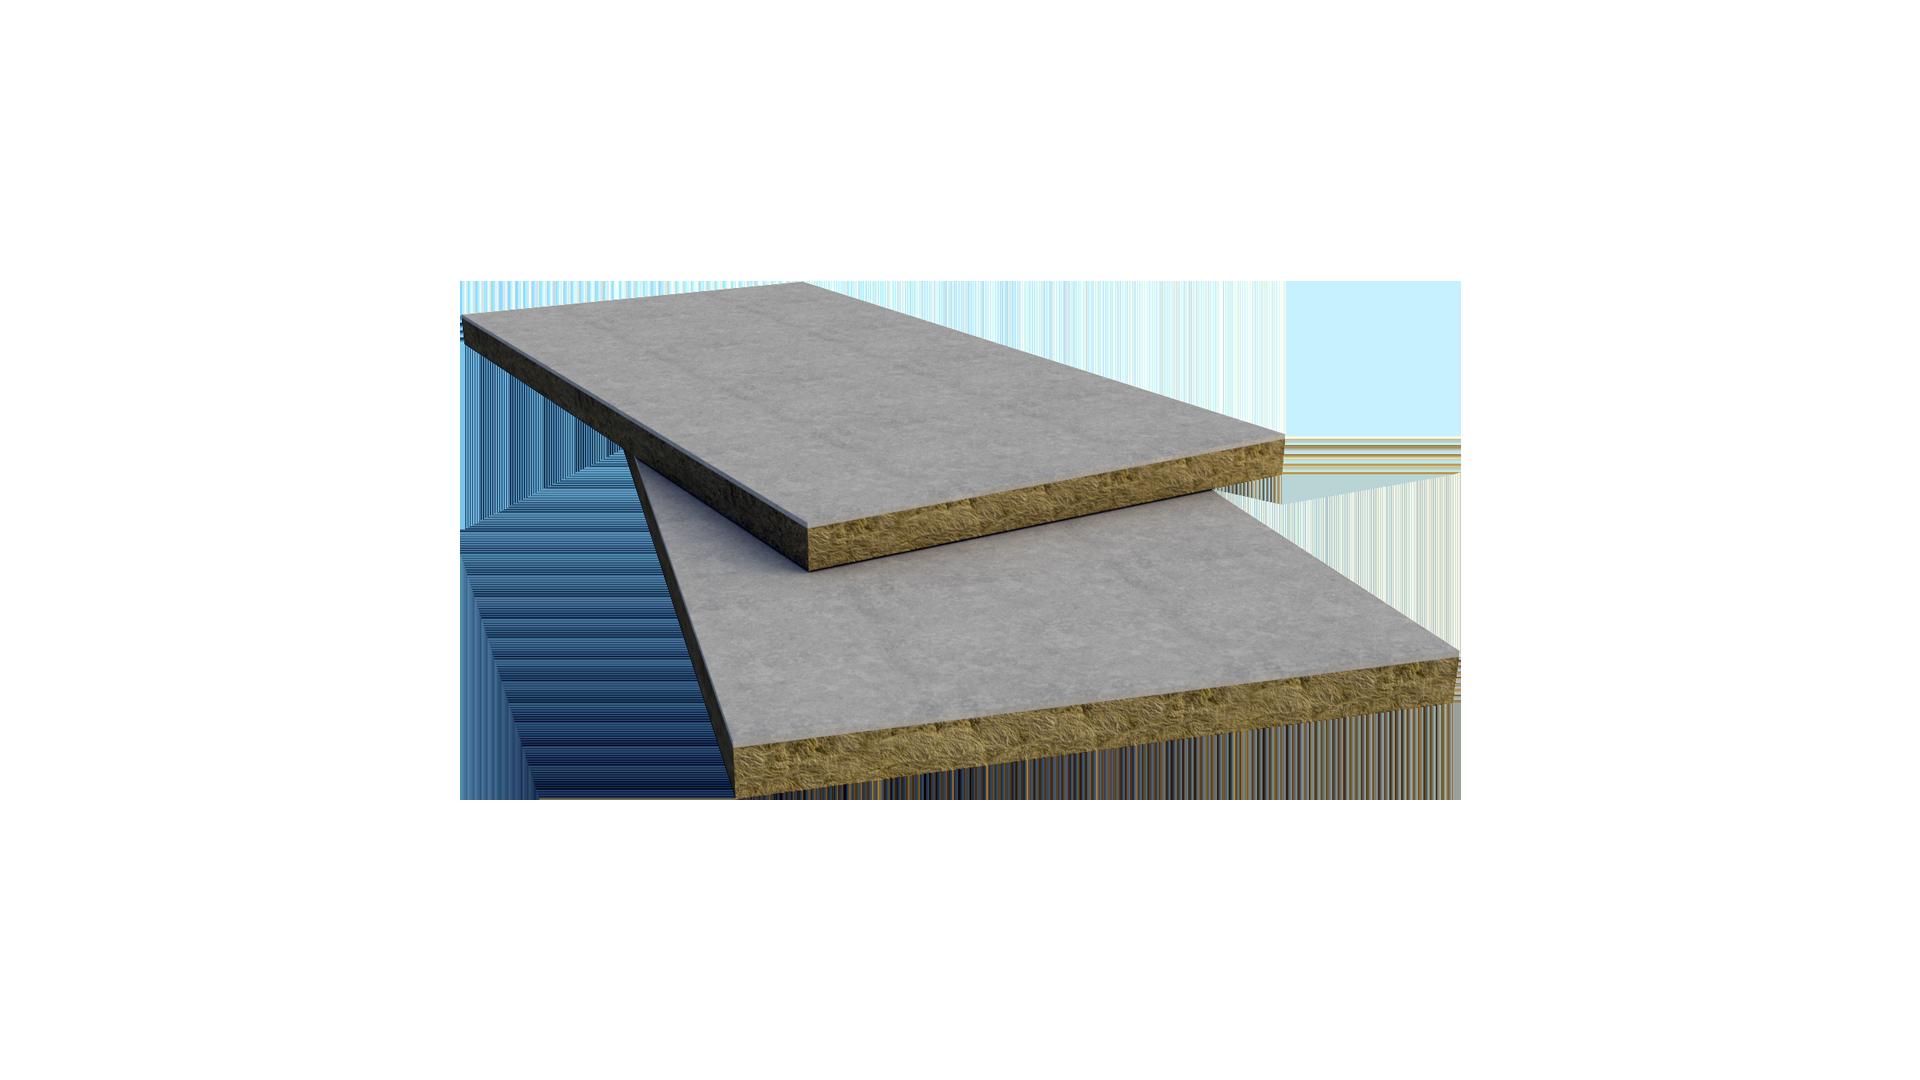 HARDROCK UB34, Upstand Board, Rendered Product Image